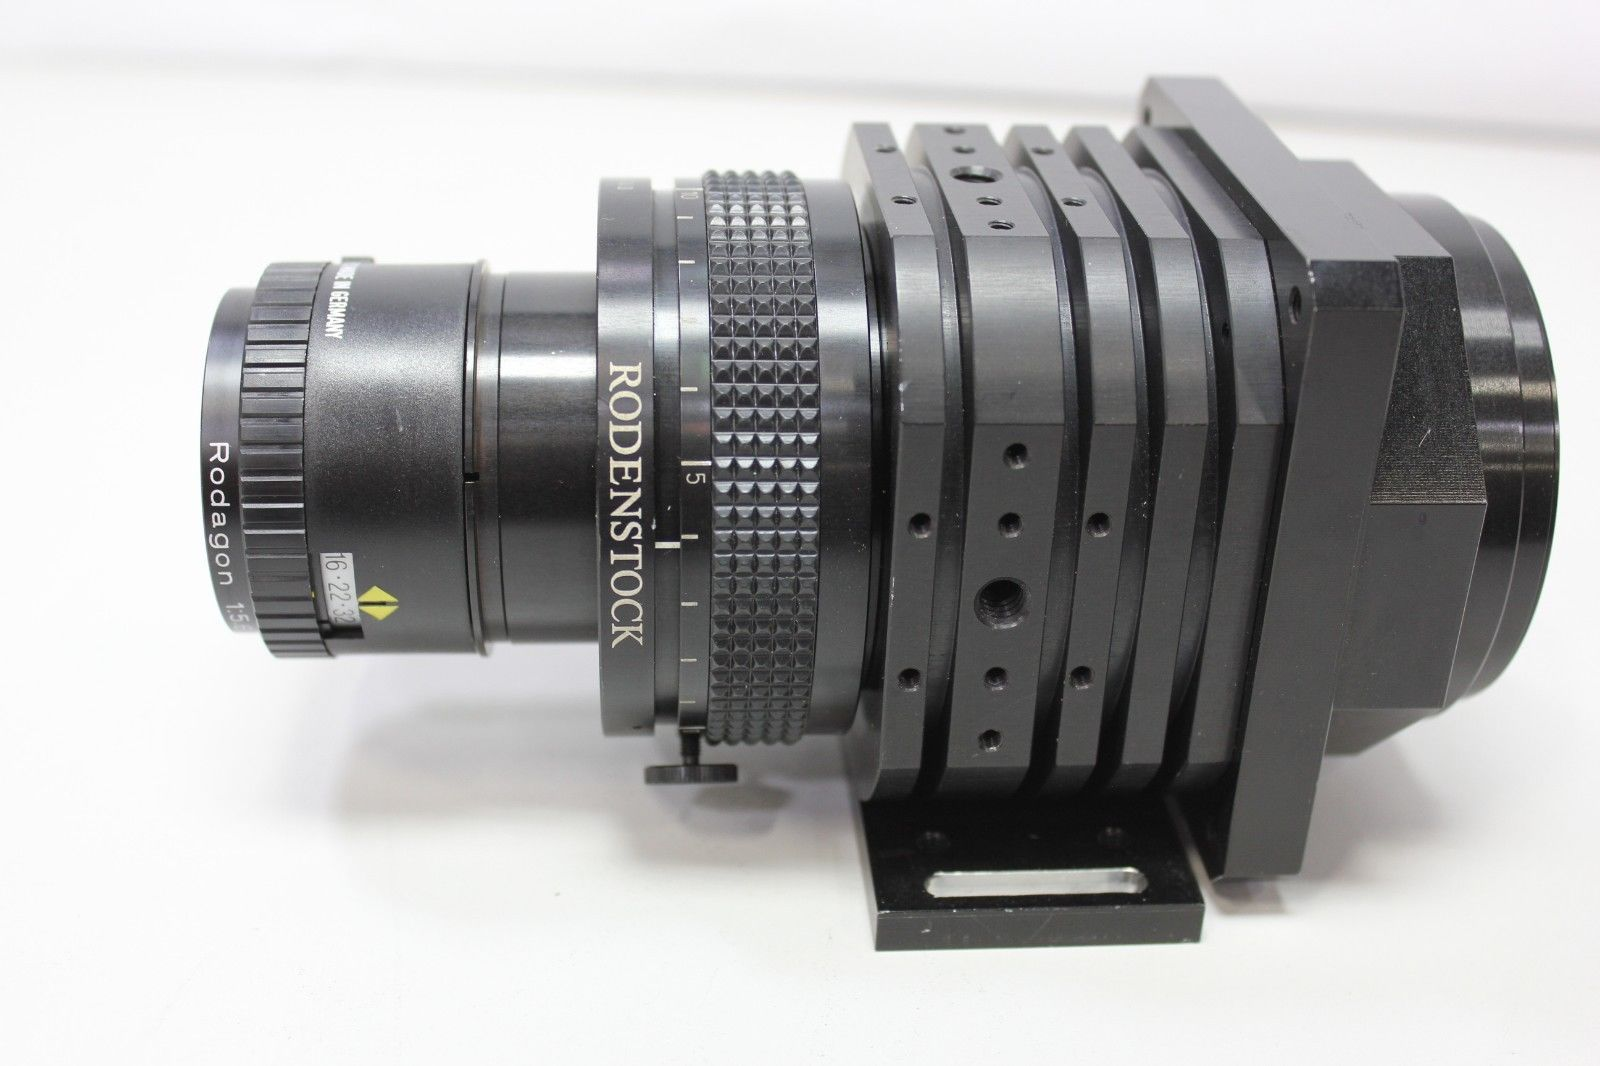 Lot 8C - Schafter & Kirchhoff Digital Line Scan Camera With Rodenstock Lens